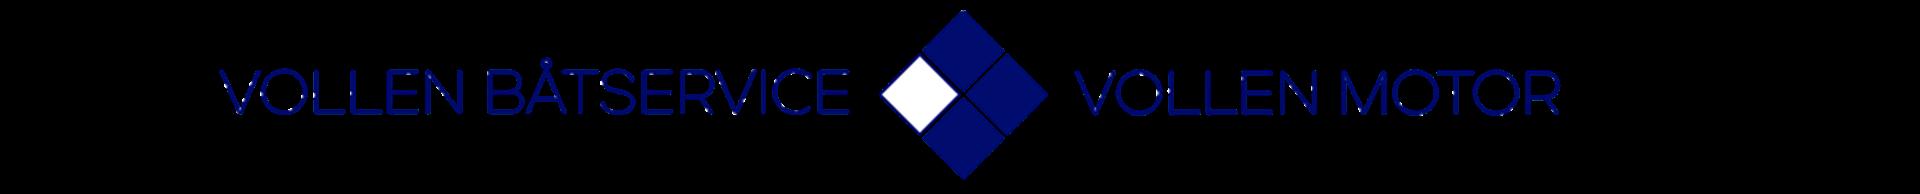 Logo x 2